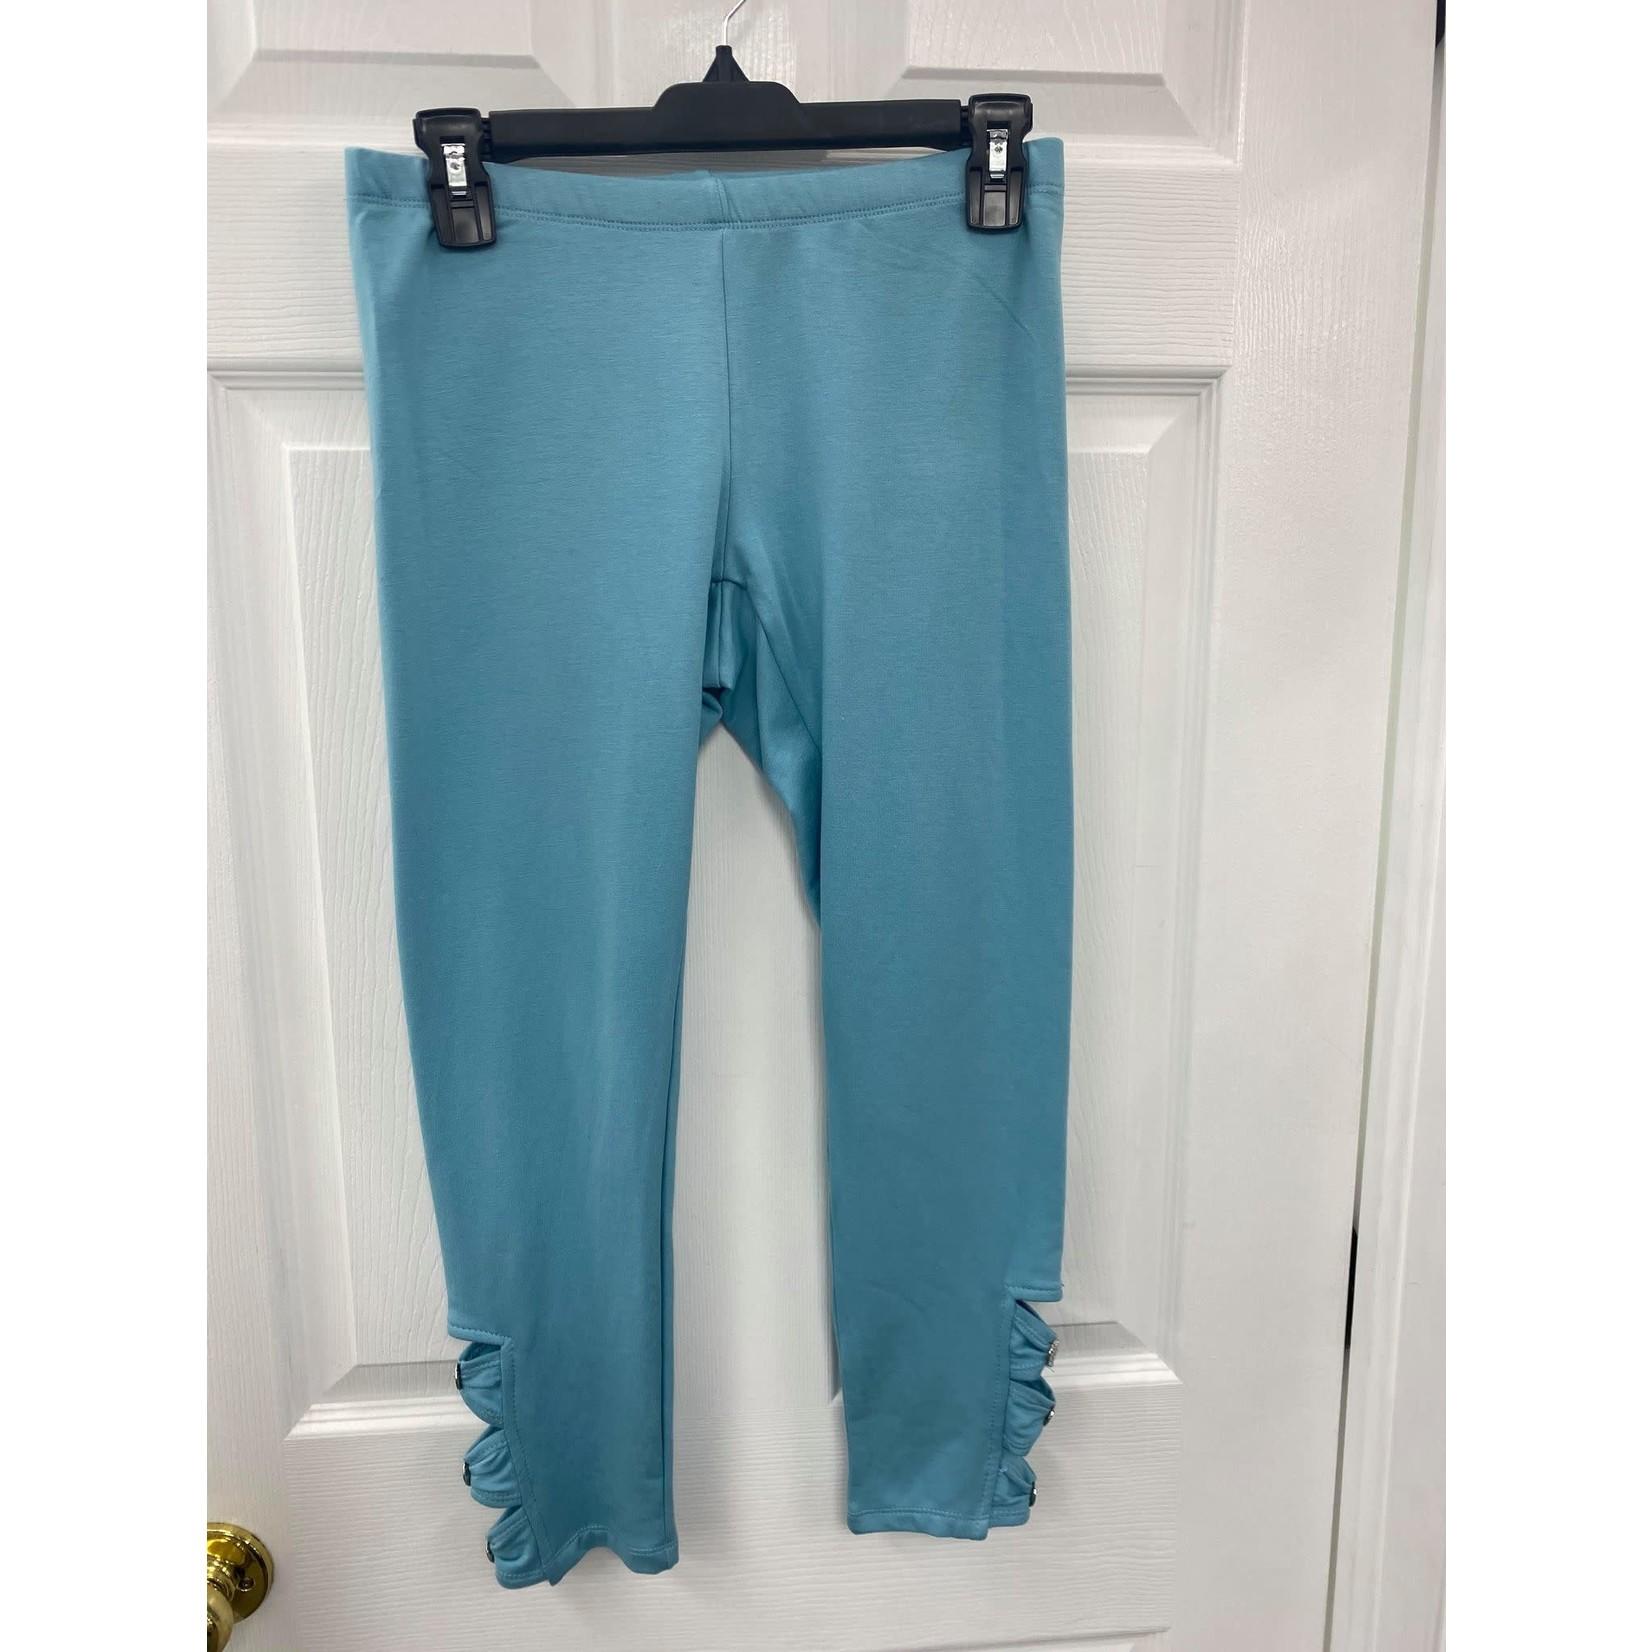 Pure Essence Capri Legging *More Colors Available*